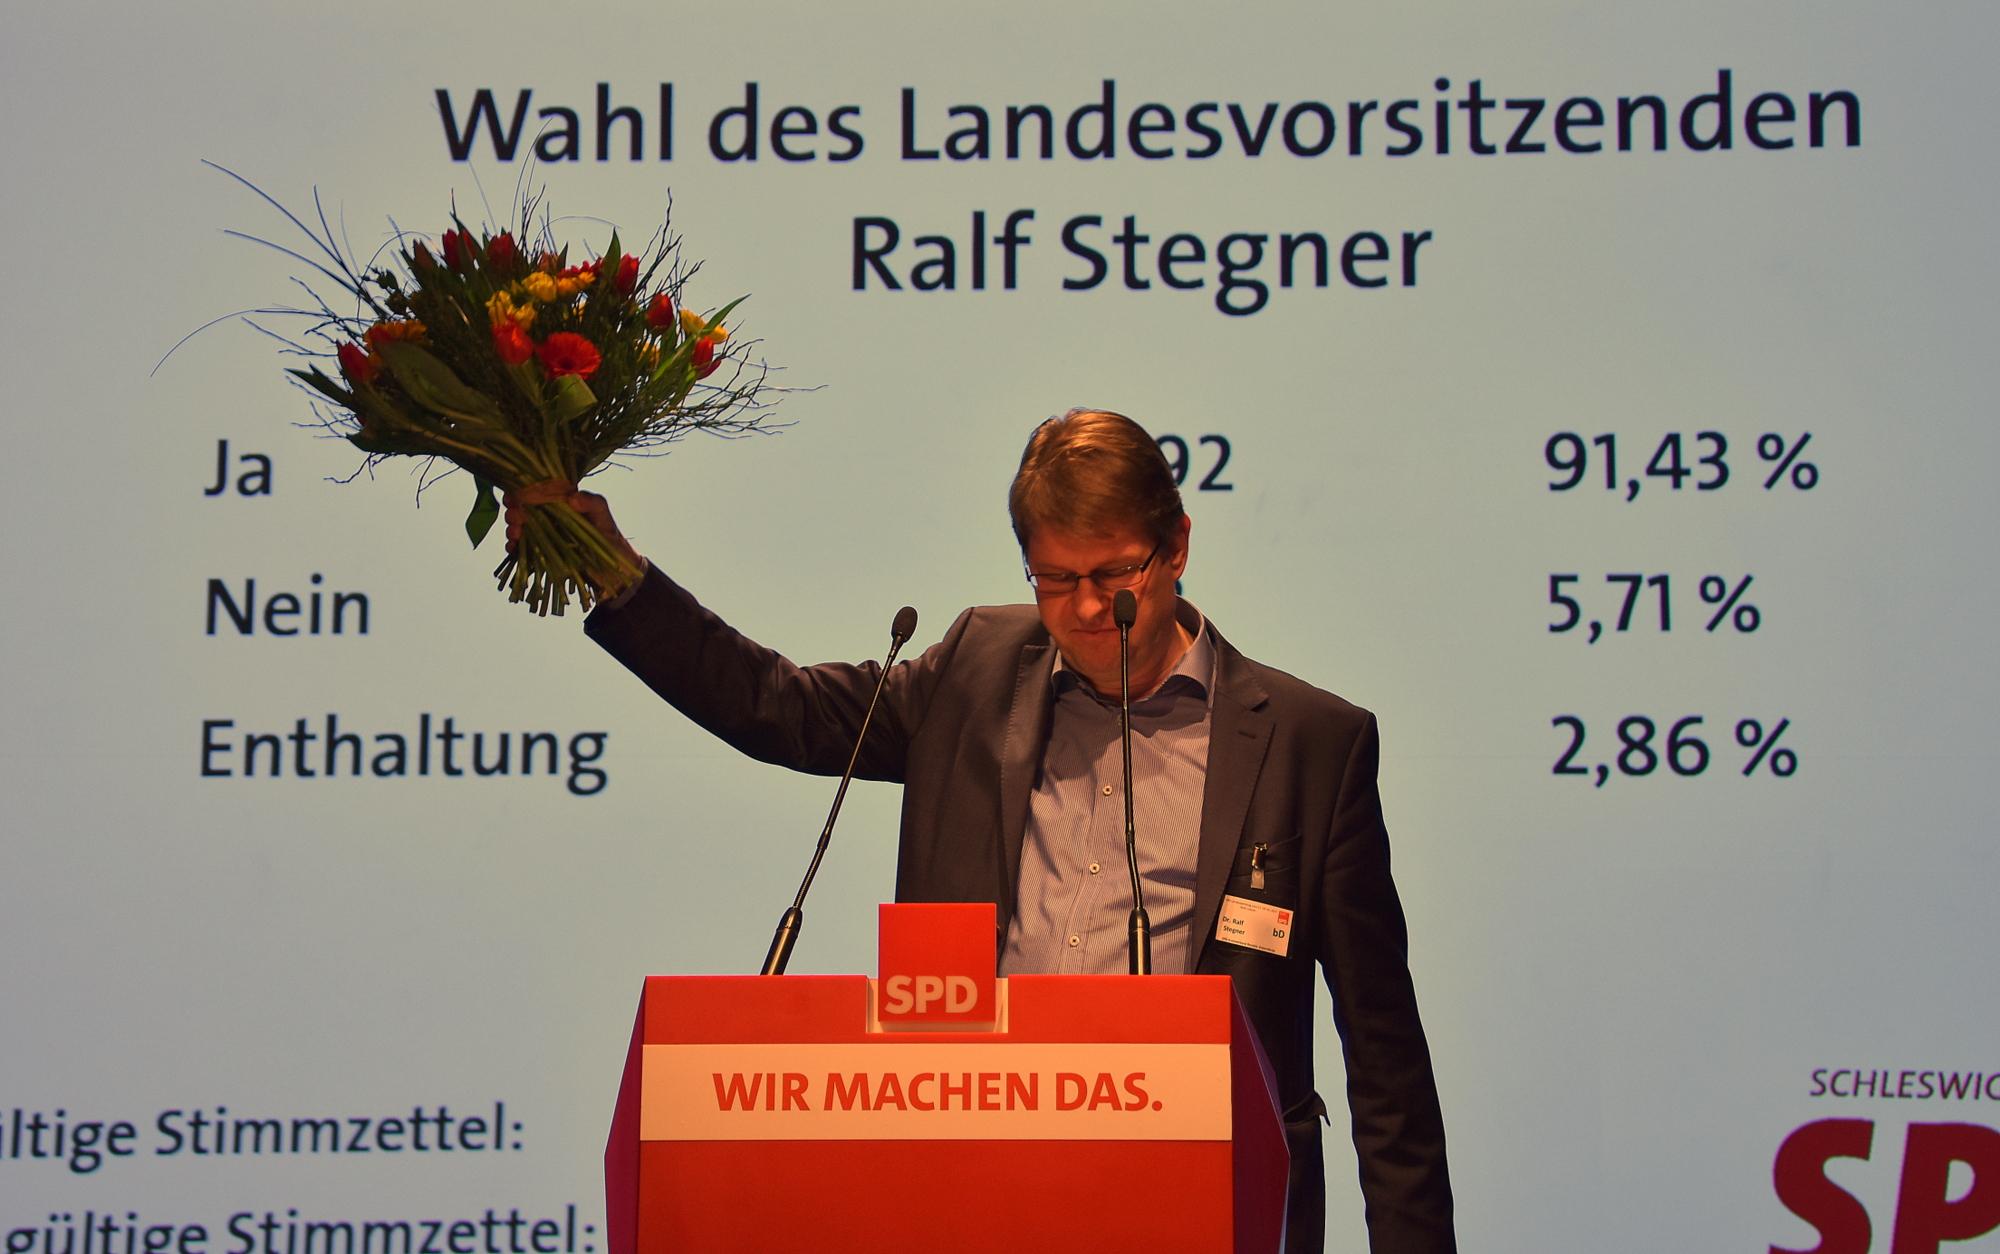 Ralf Stegner_Foto: Steffen Voß / CC-BY-SA